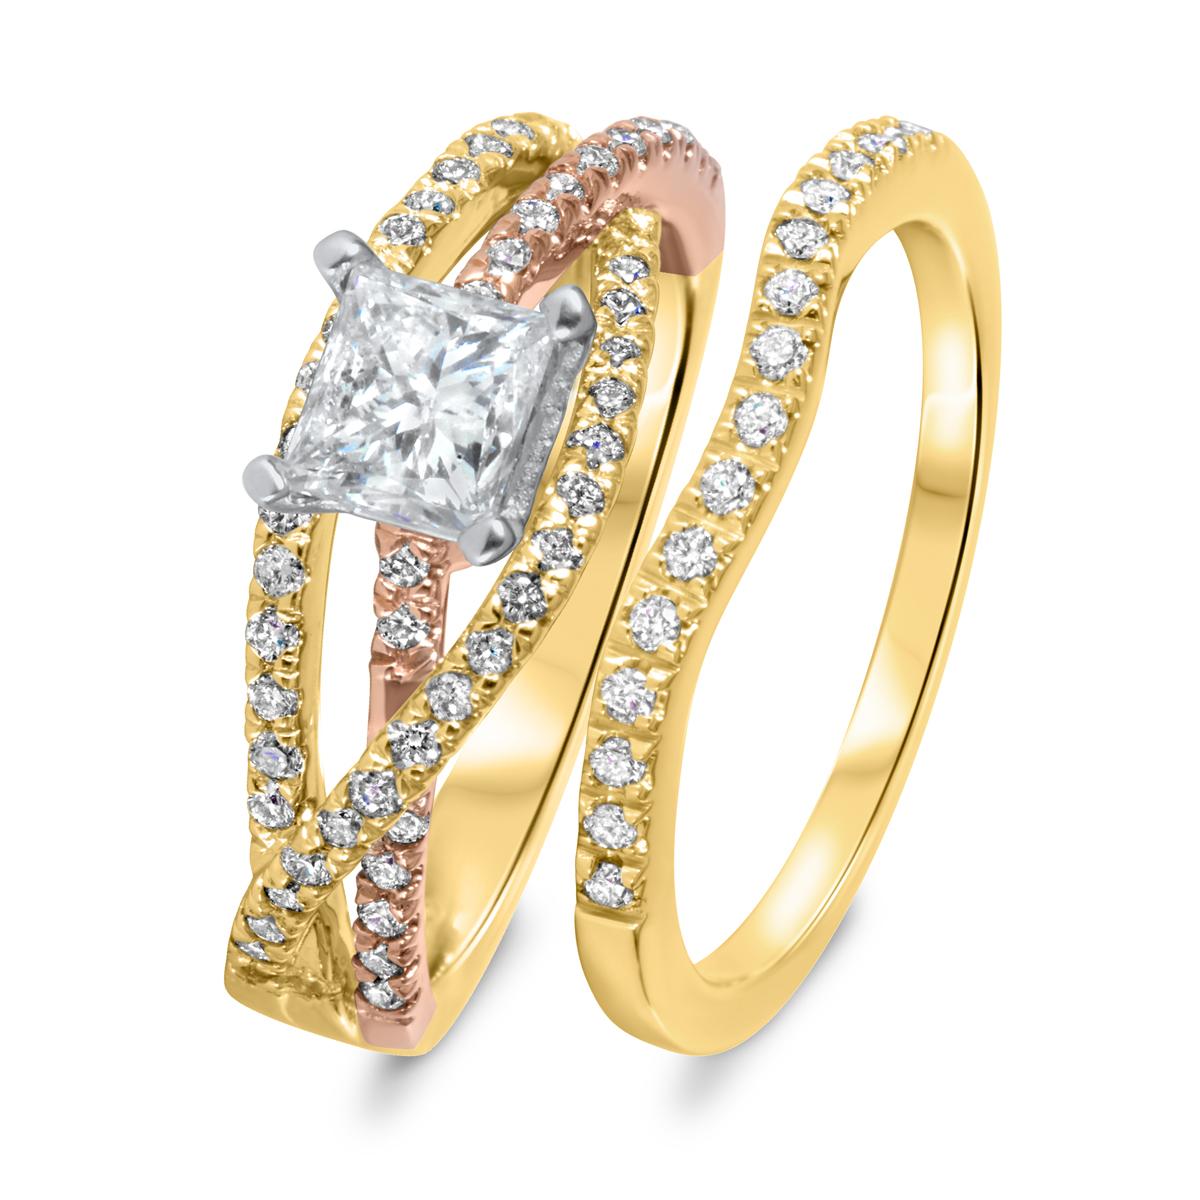 1 1/7 CT. T.W. Diamond Women's Bridal Wedding Ring Set 10K Yellow Gold